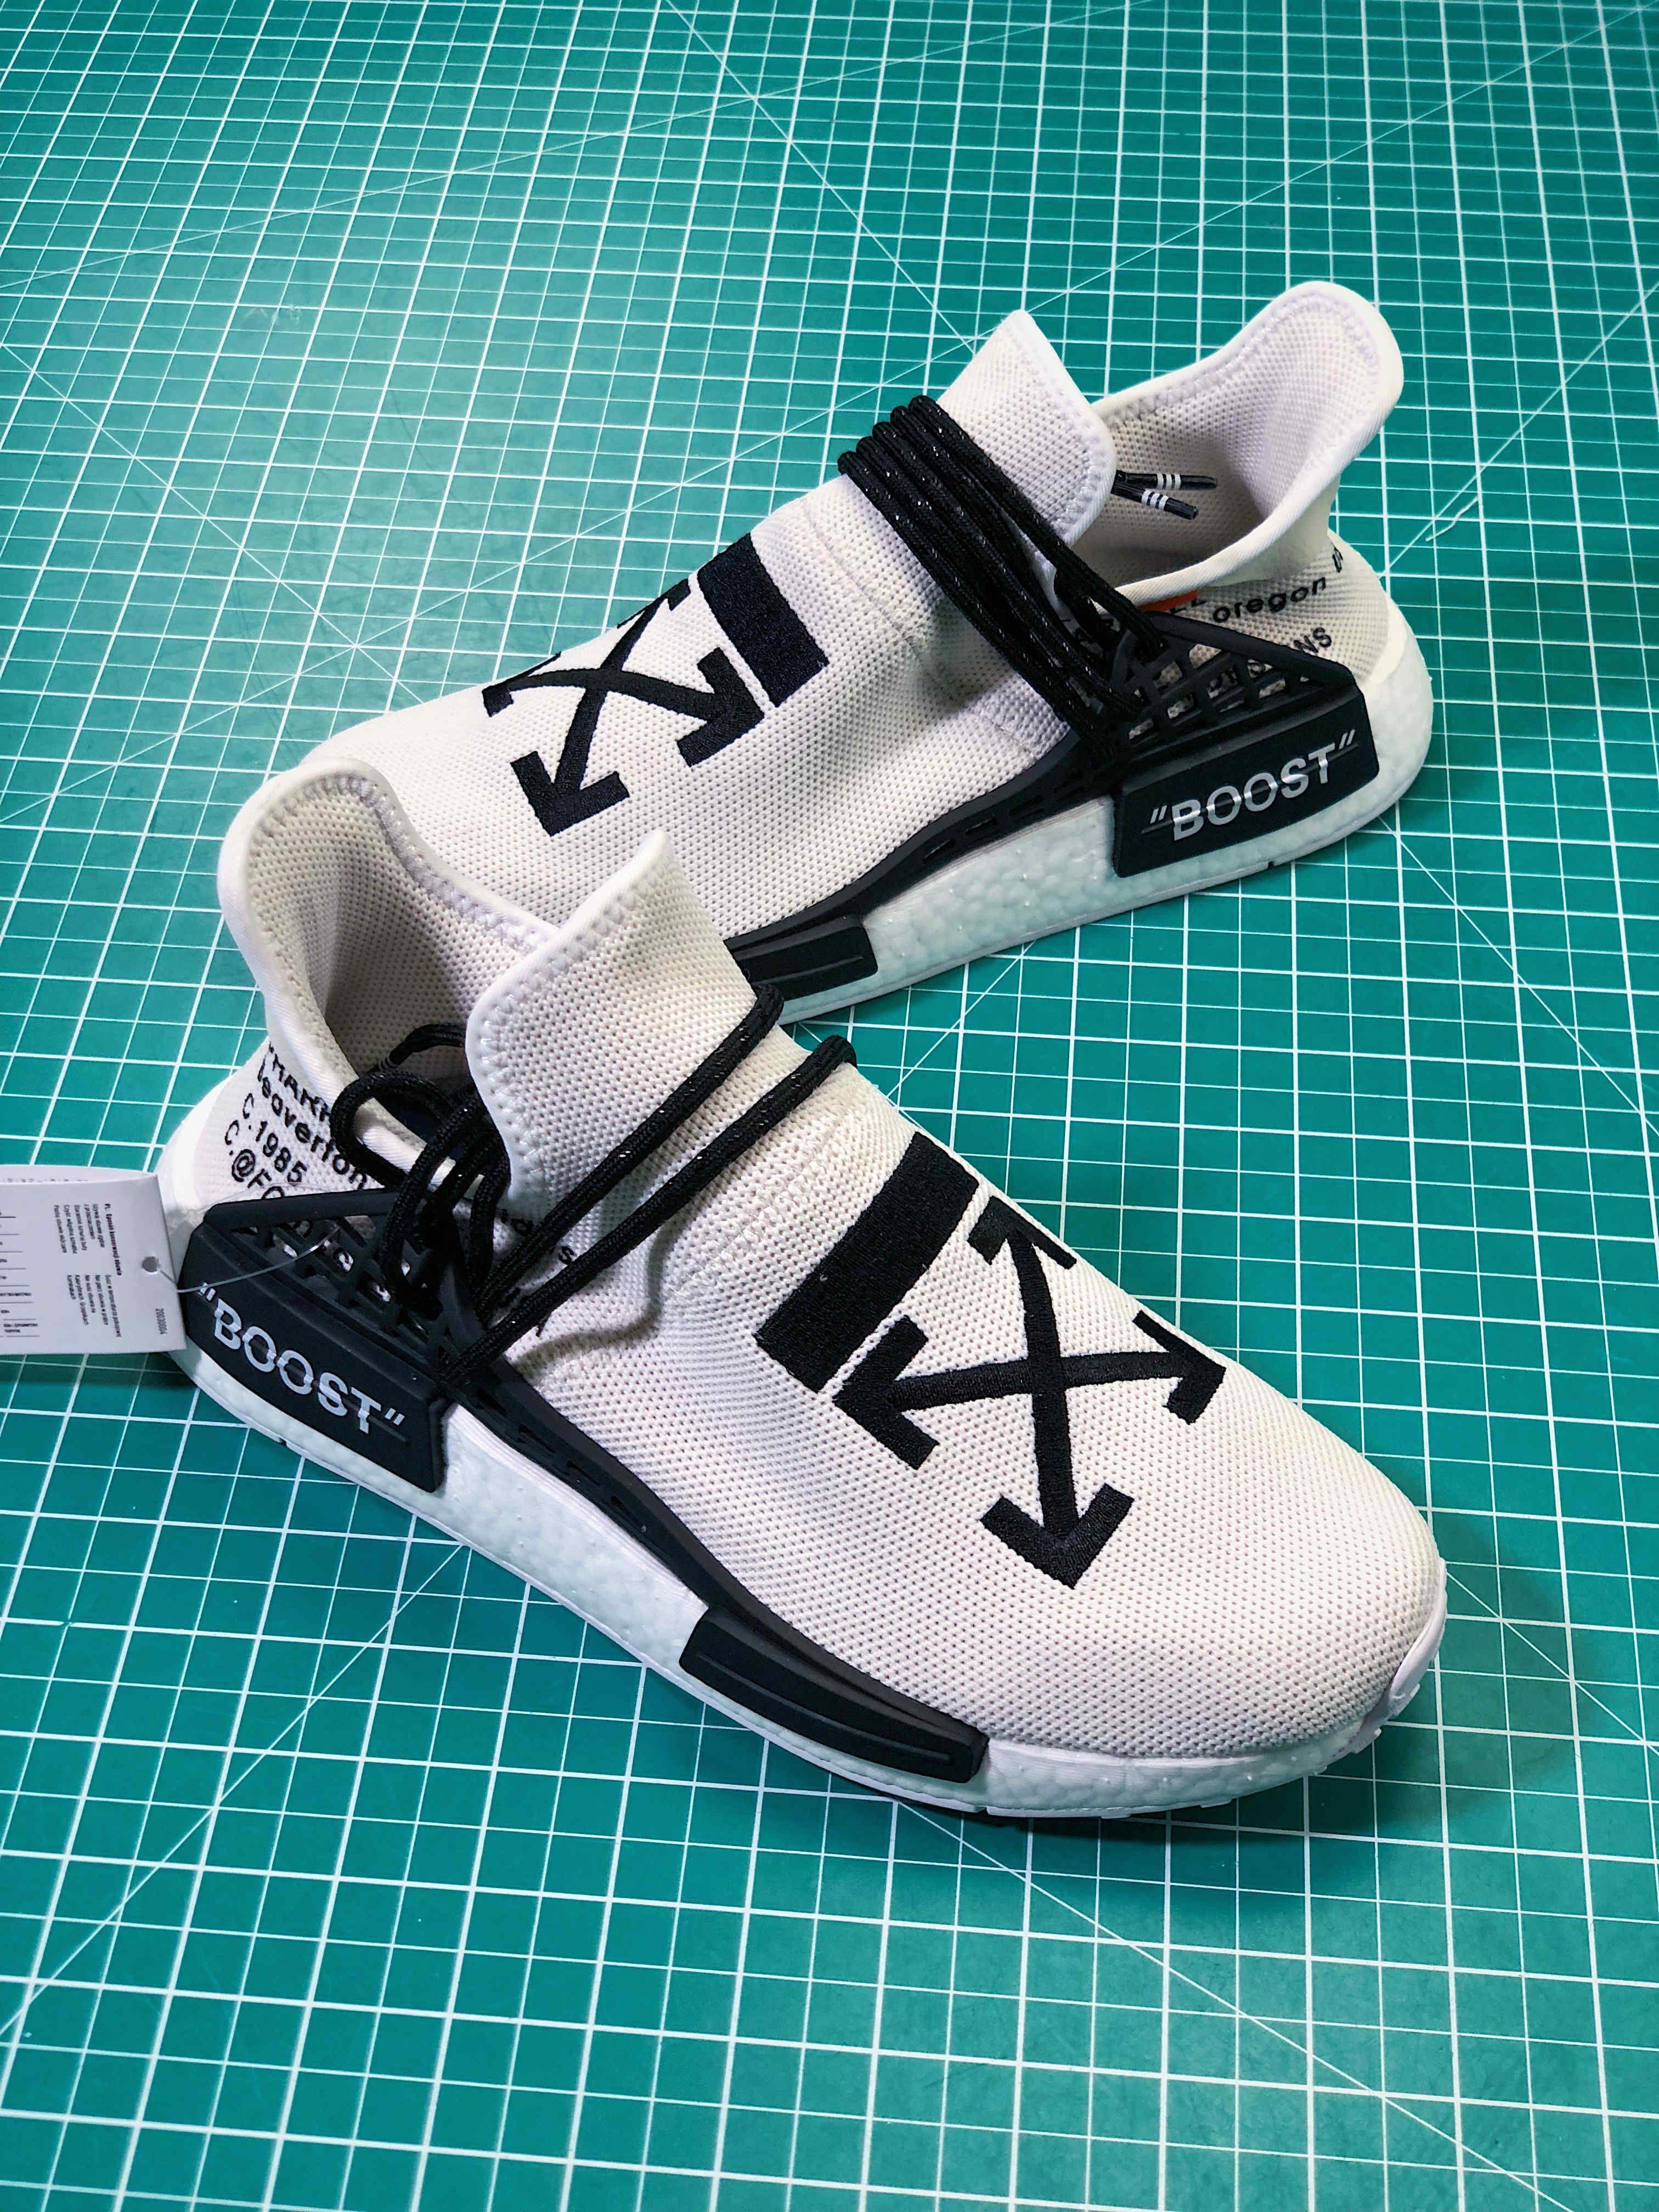 Custom Off-White x Adidas NMD HU